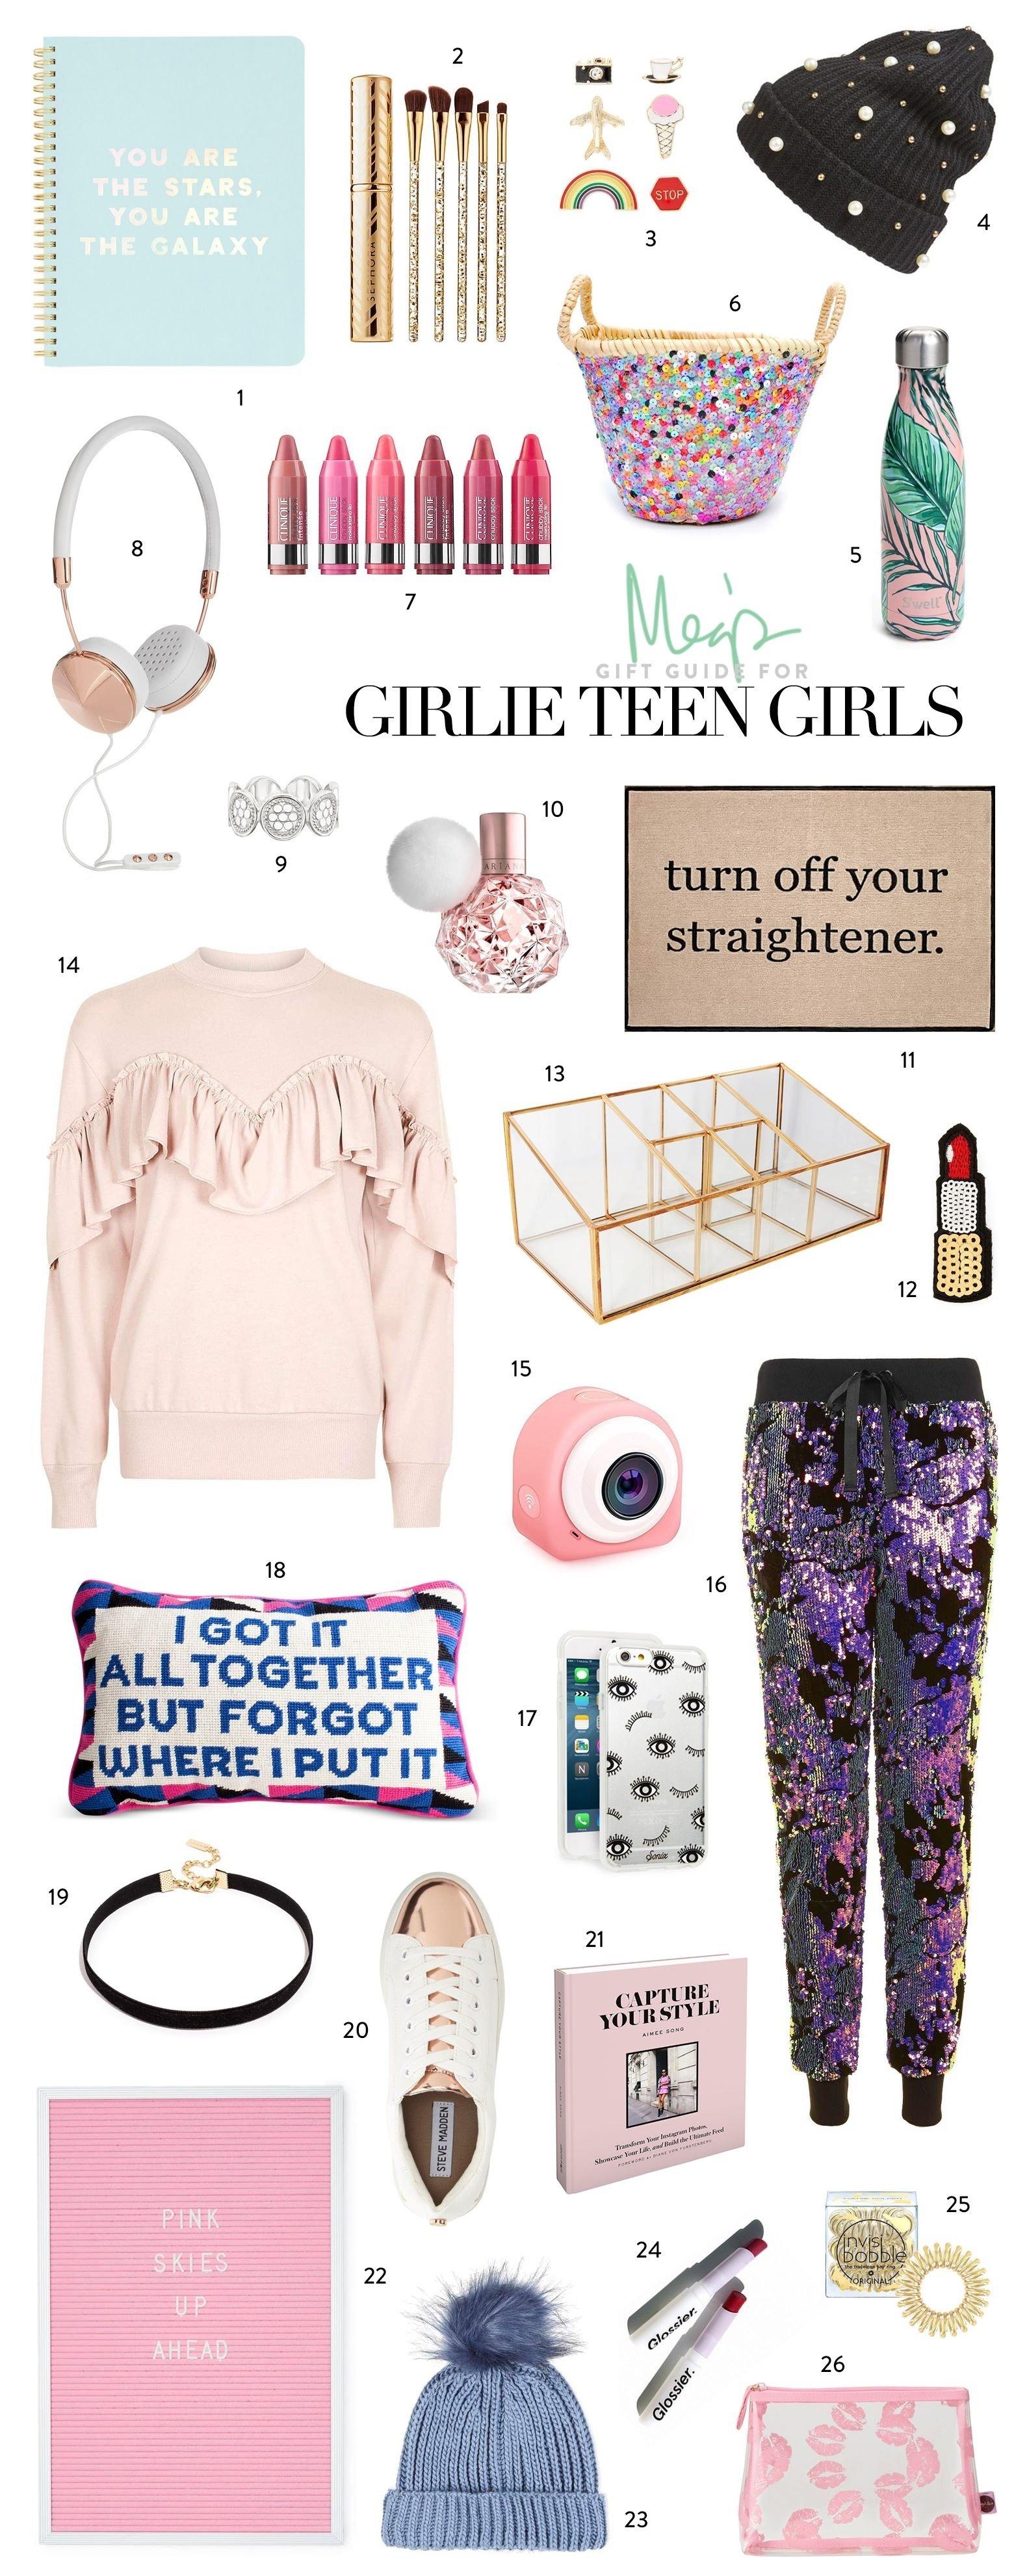 10 Most Popular Gift Ideas For Tween Girls holiday gift guide girlie teen girls holiday gift & 10 Most Popular Gift Ideas For Tween Girls 2019